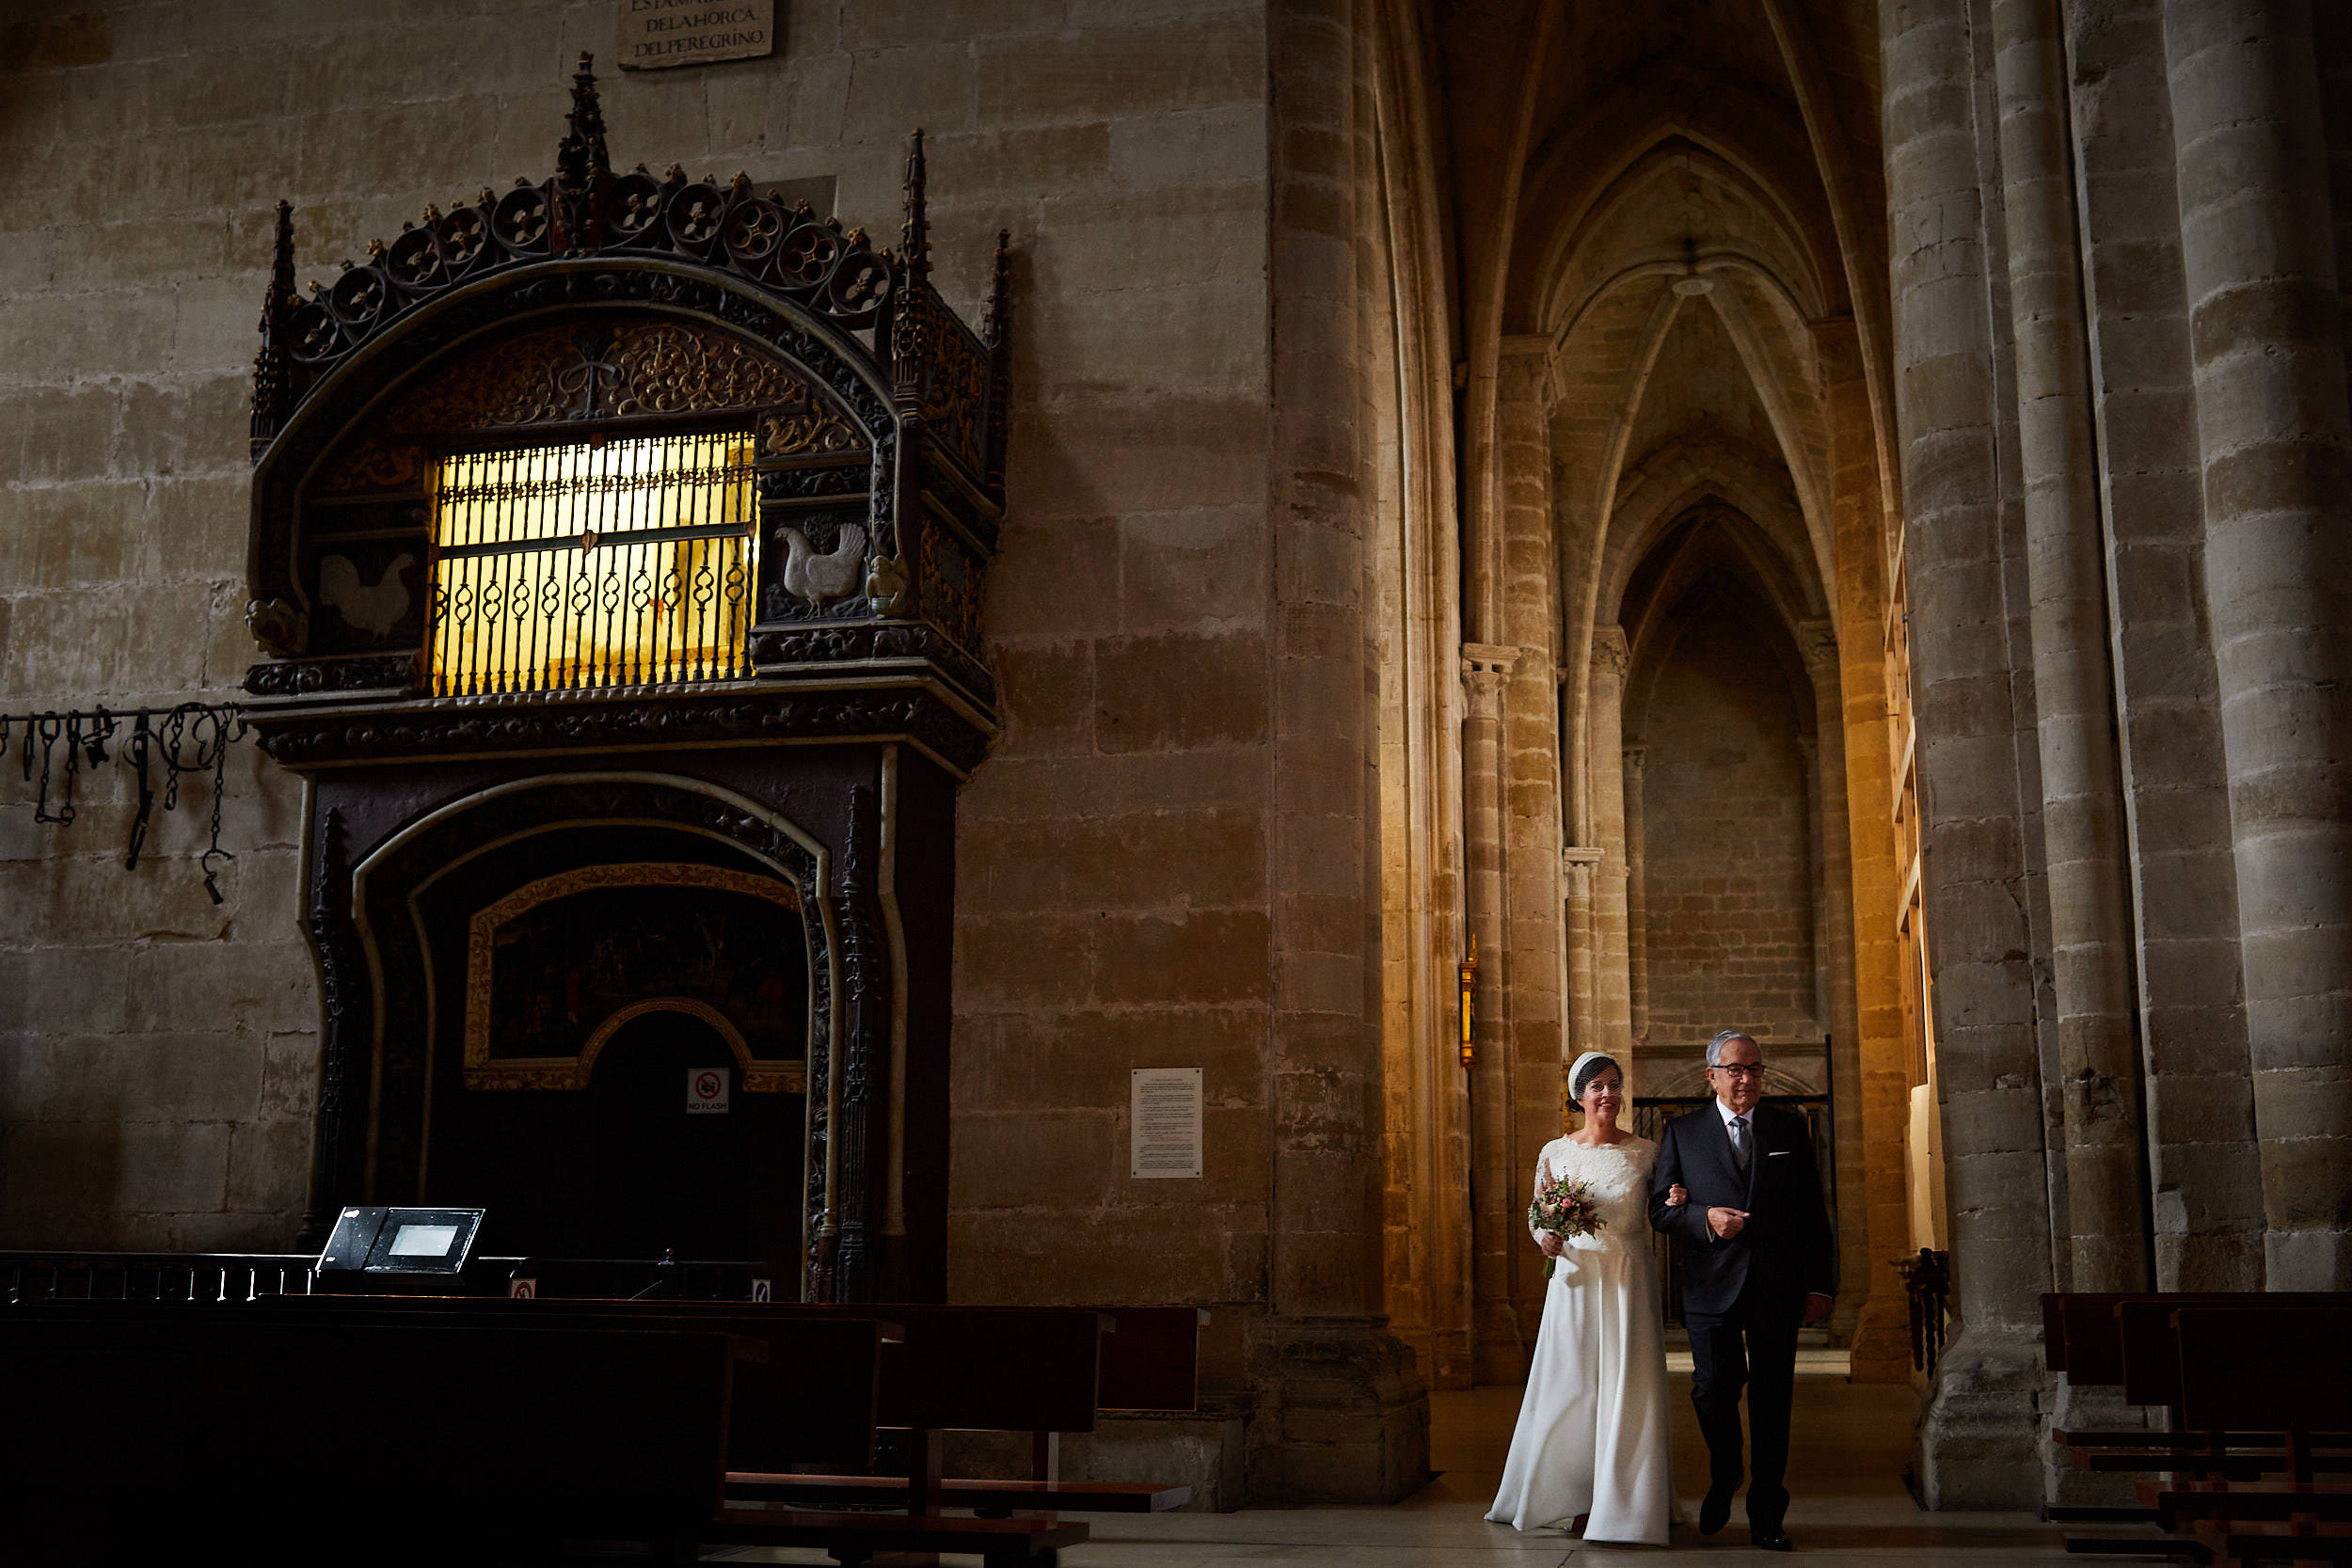 1811Basque_Country_Rioja_Wedding_Photographer_James_Sturcke_0040.jpg